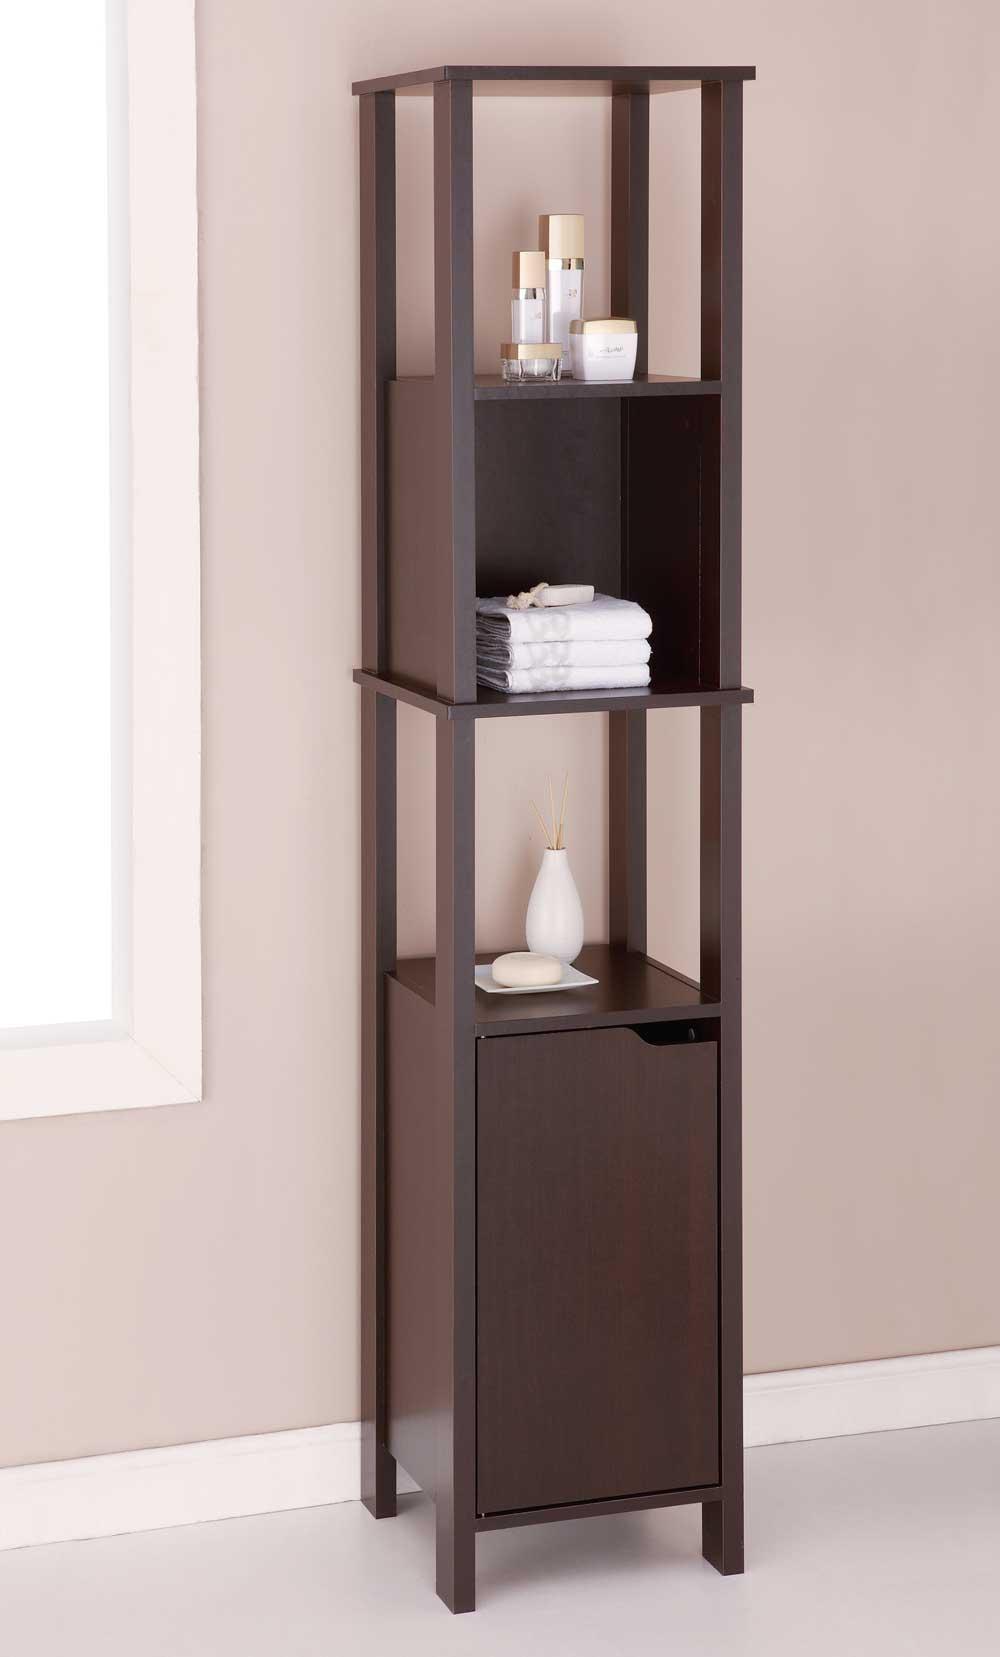 home bath bathroom shelves and hooks bathroom shelves wood cabinet